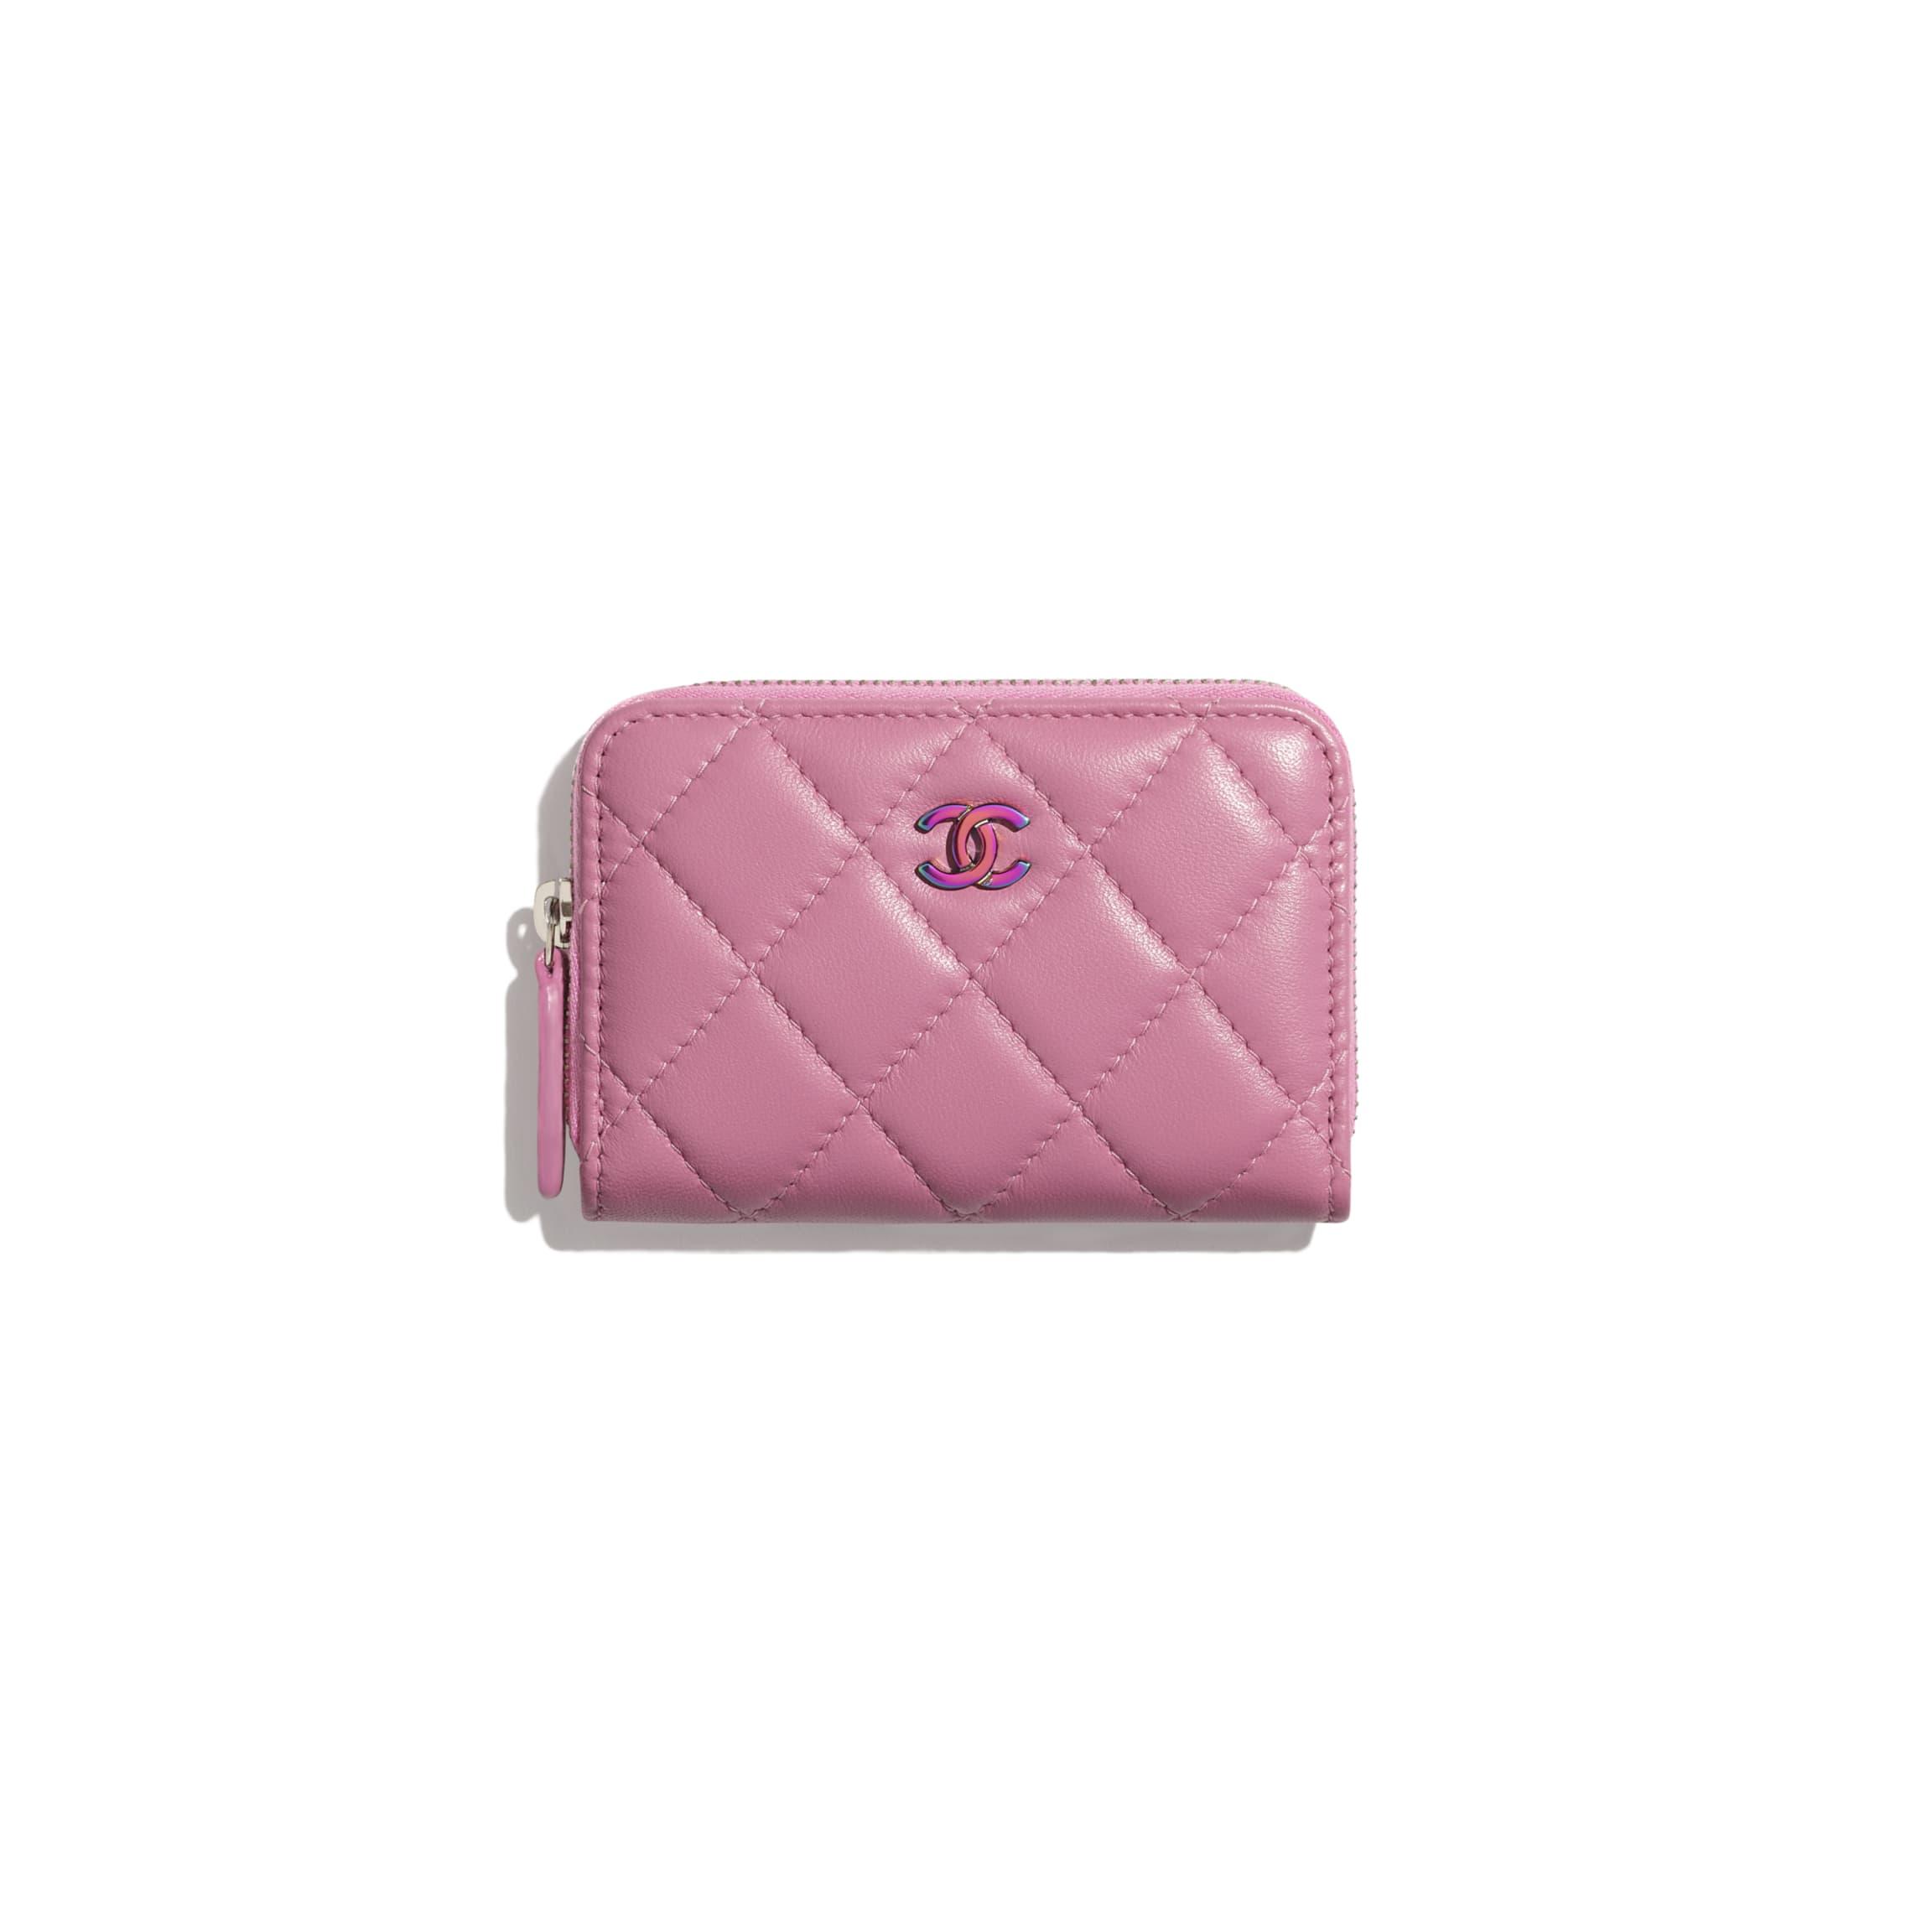 CHANEL  經典拉鏈零錢銀包 小羊皮及幻彩色金屬 粉紅色 HK$4,300